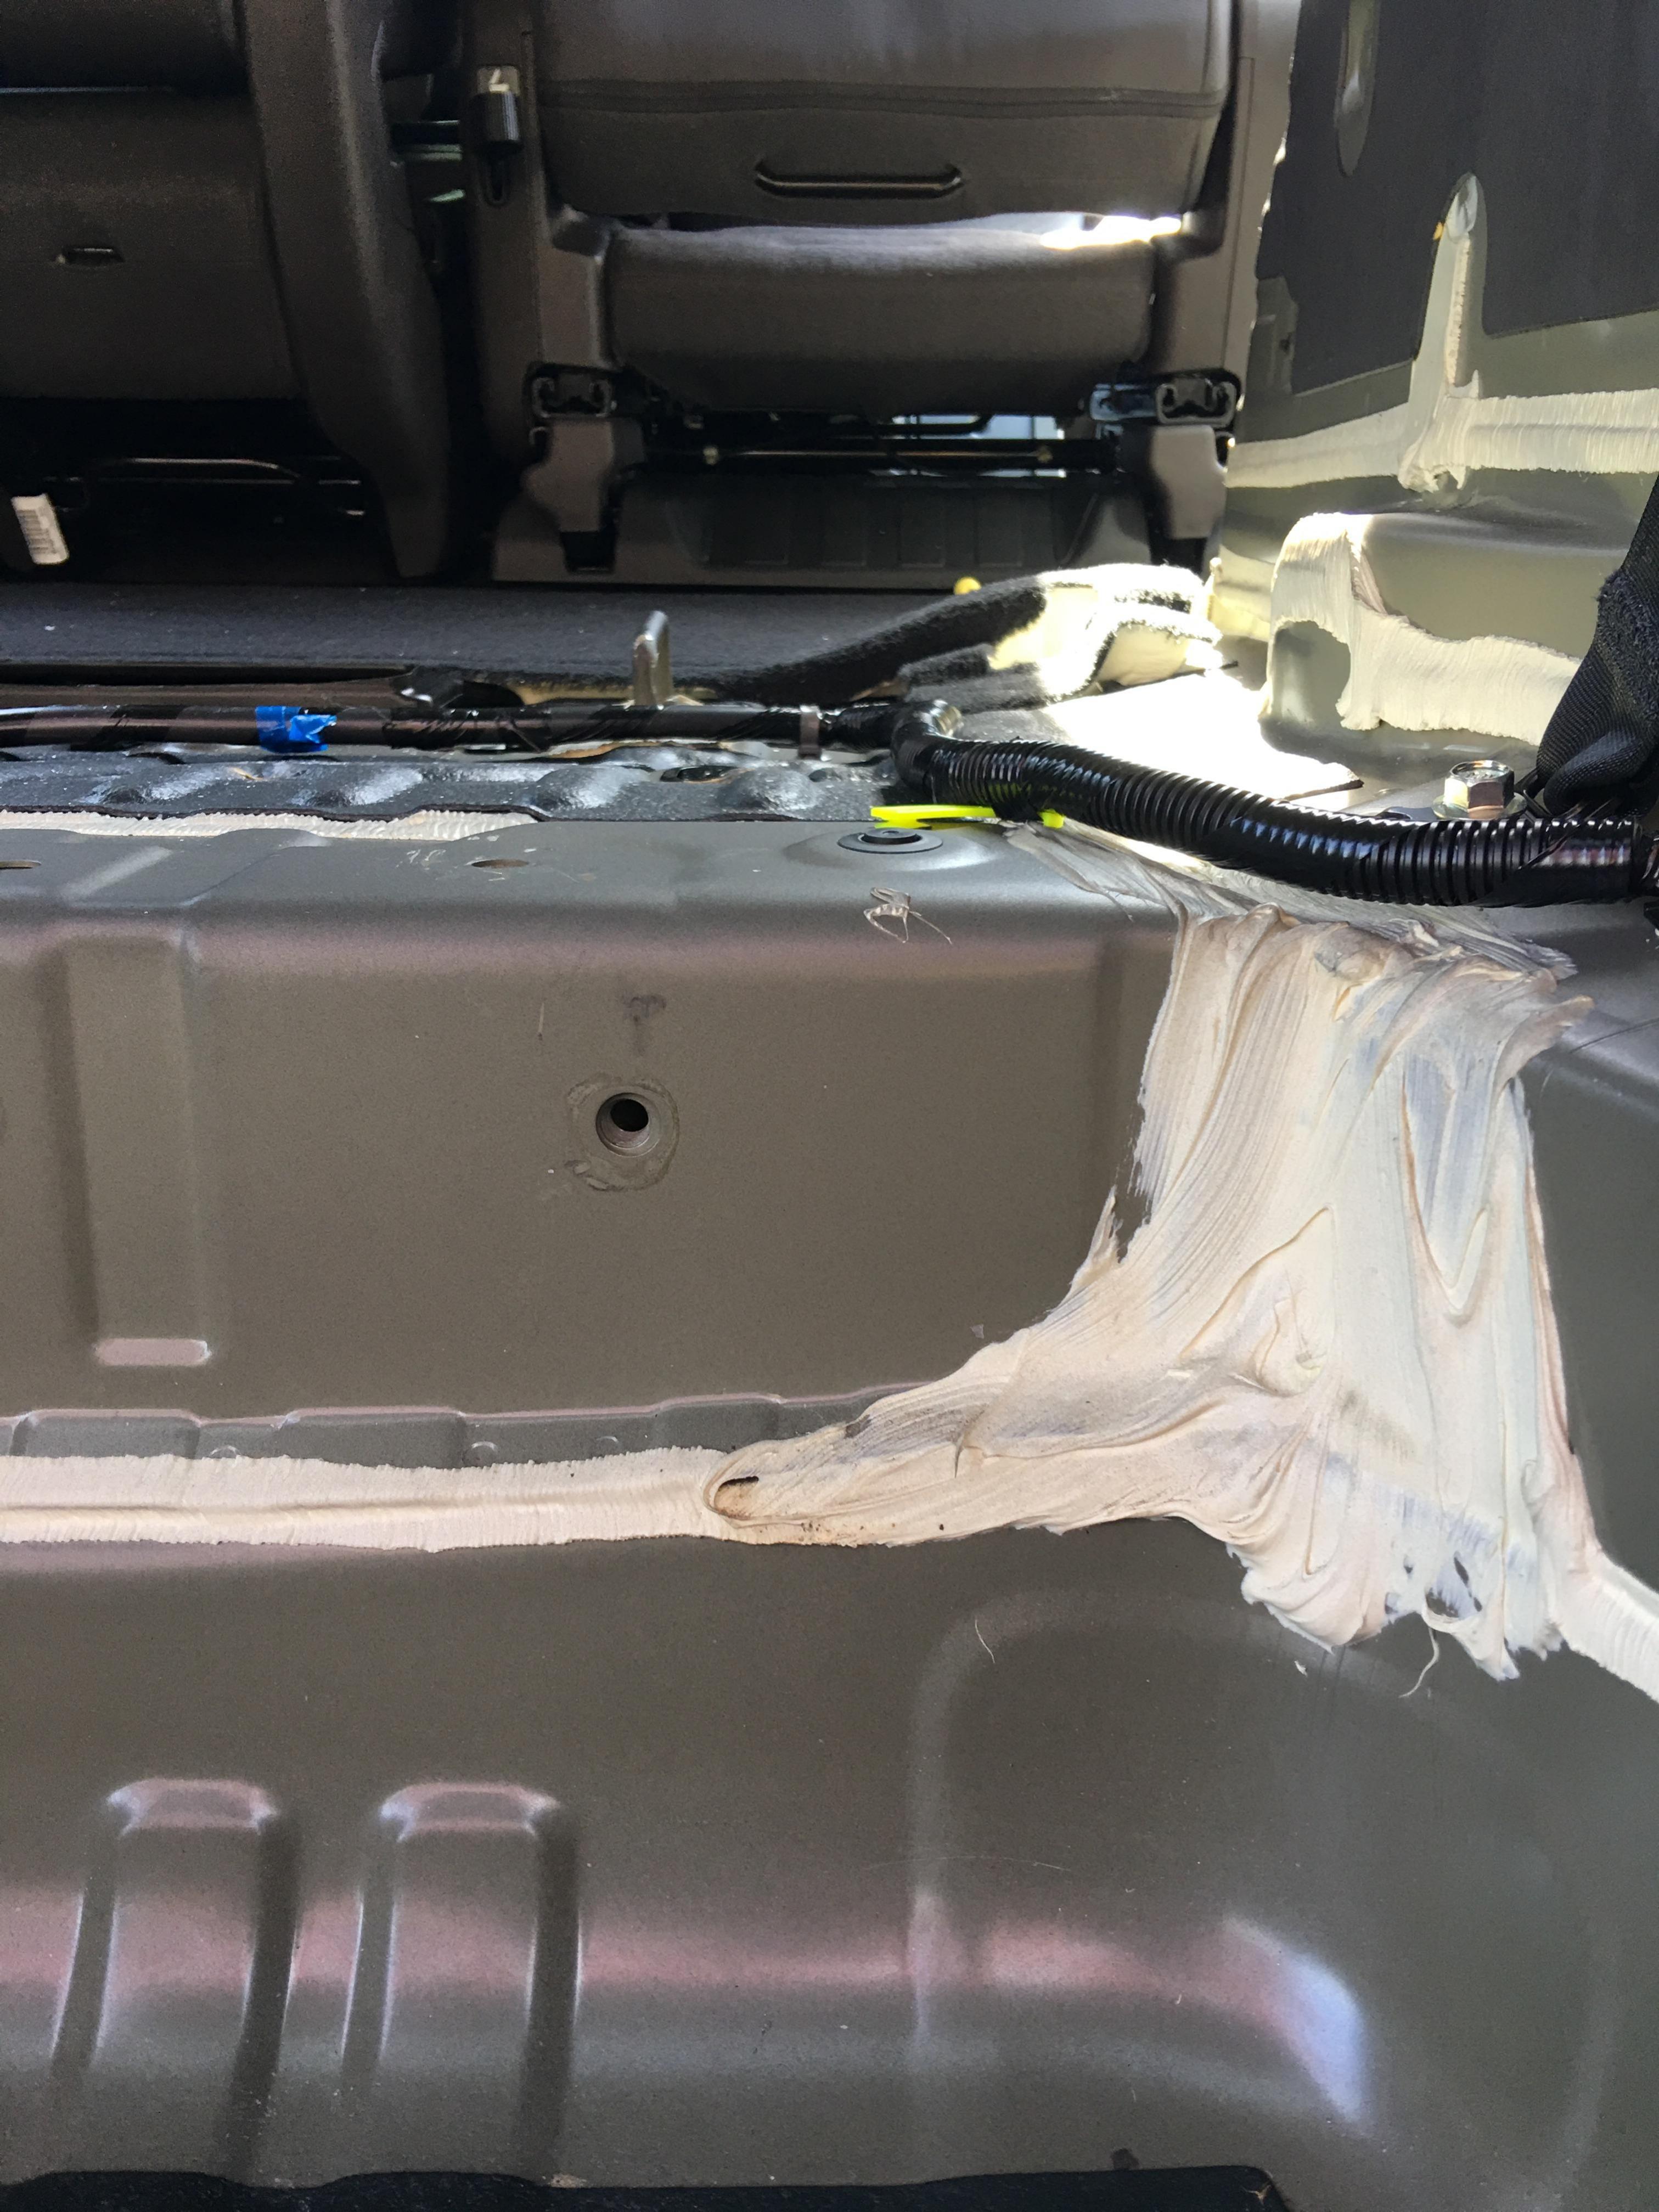 Rear Cargo Hold Floor Pan Seam Seal Water Intrusion-1f015fd5-42ab-47fc-9ebd-0b27dad9970d_1555455359903.jpg